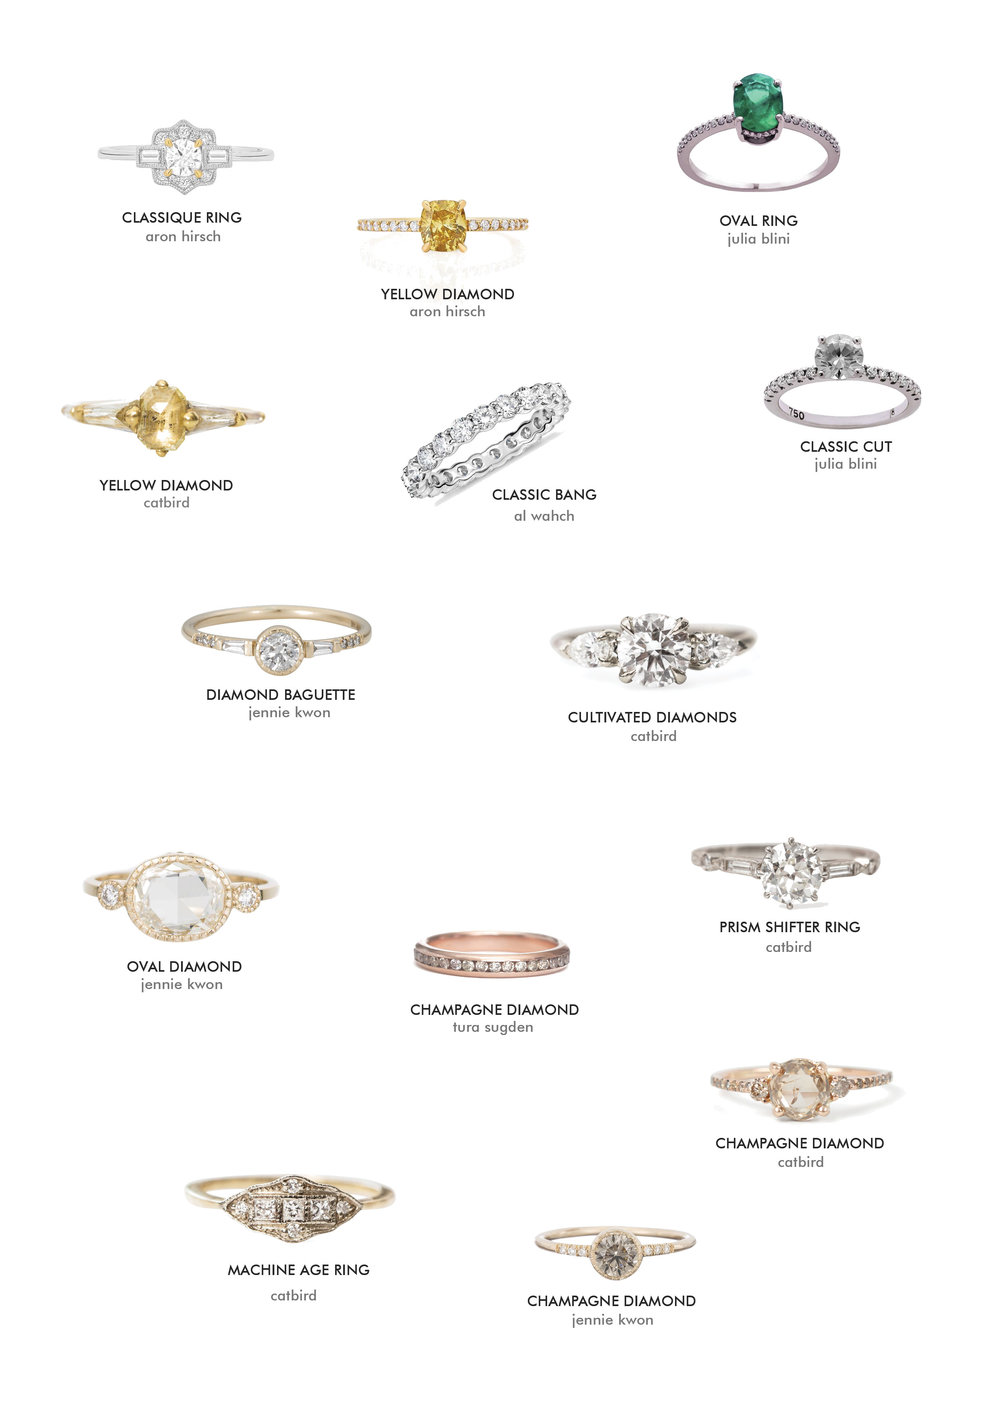 engagement ring - Qual seu estilo de anel de noivado?